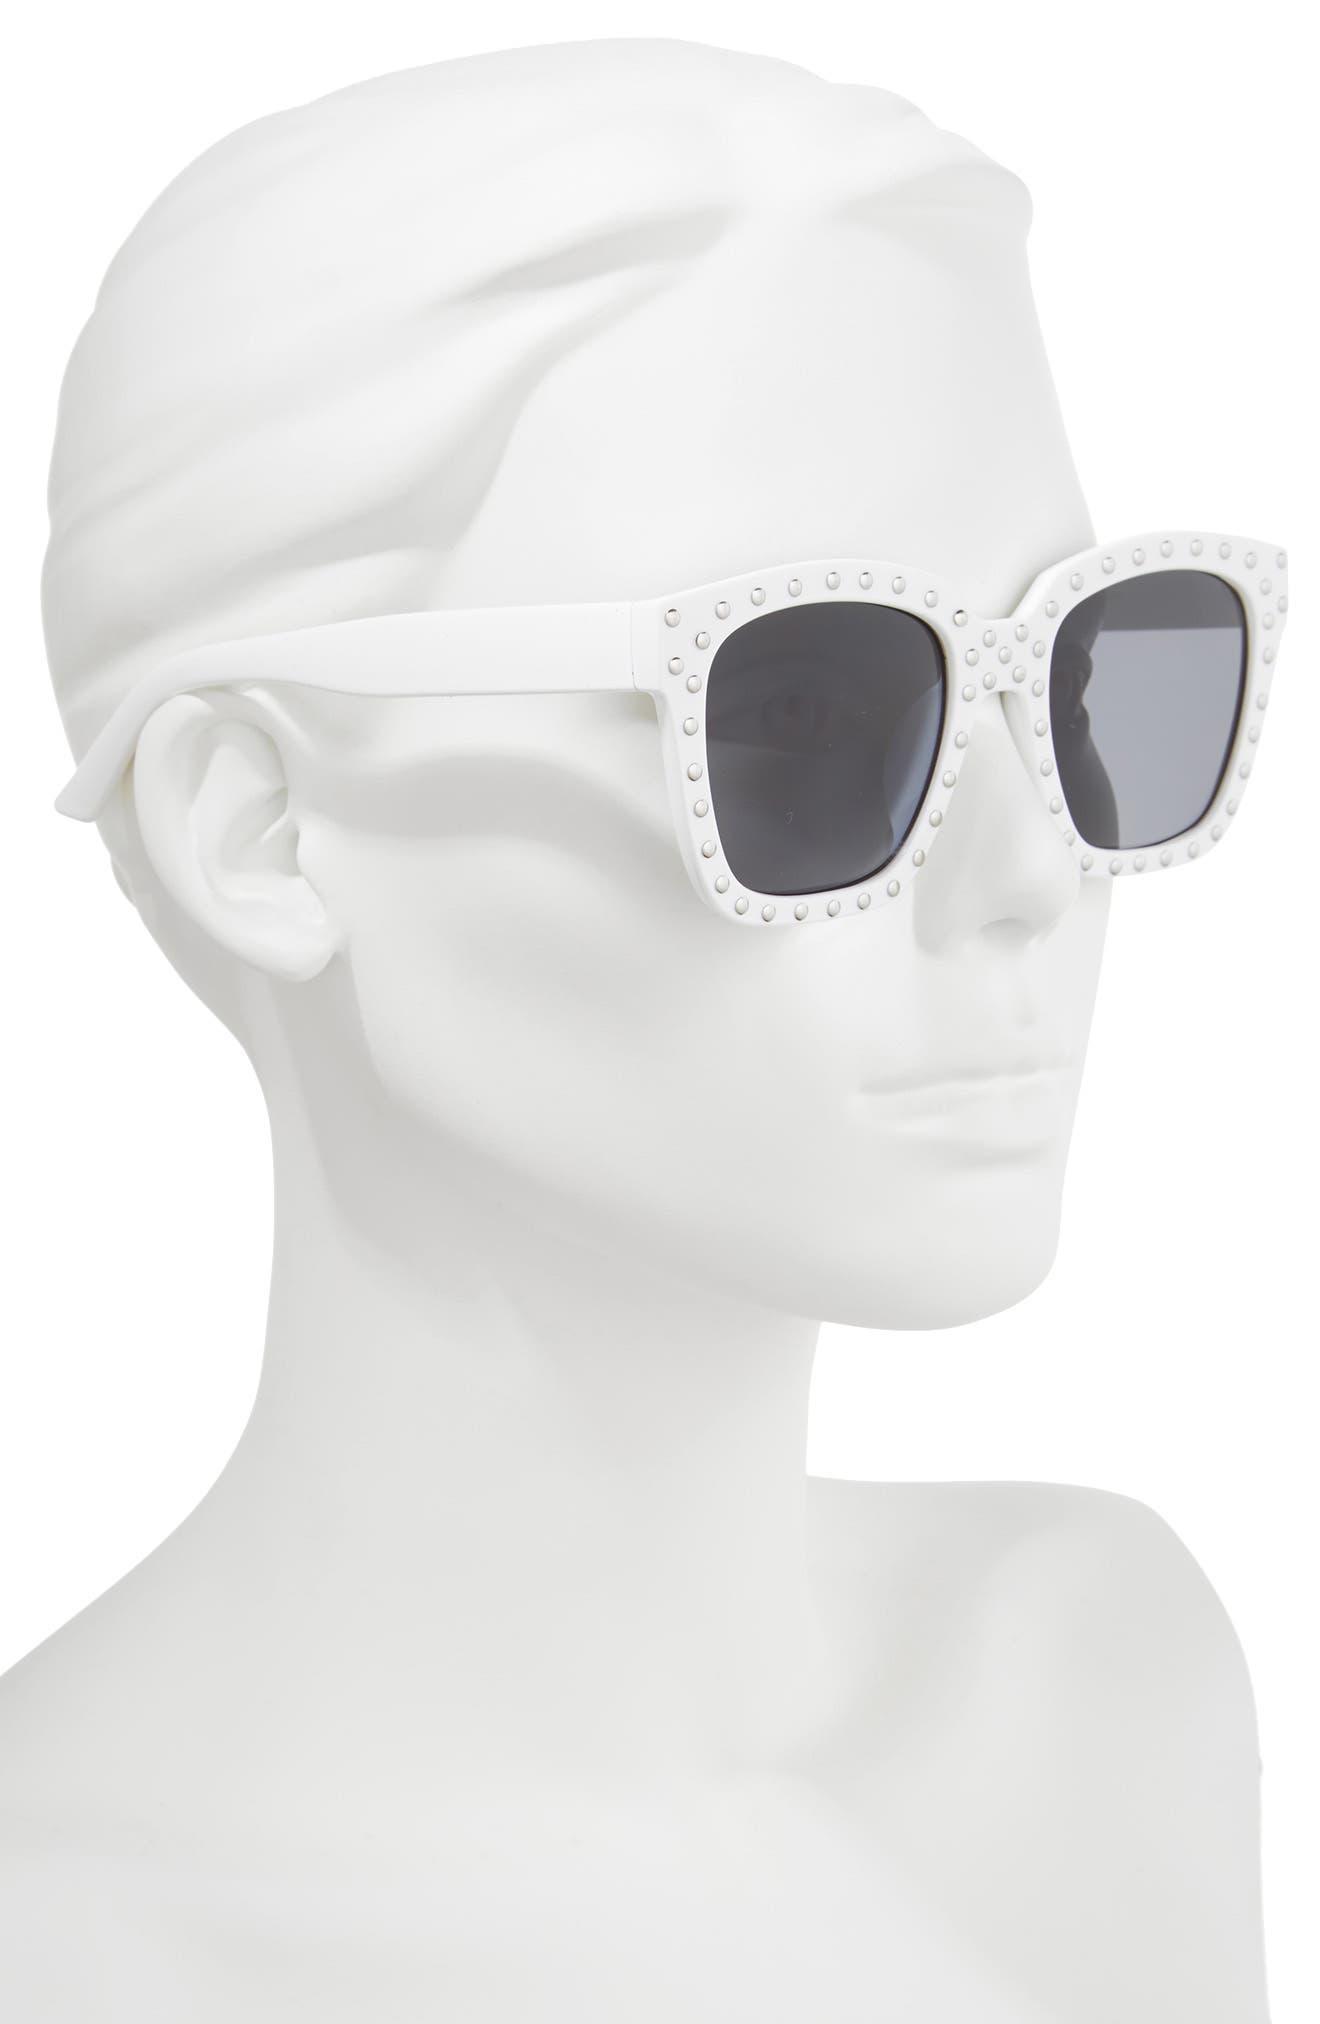 Studded Square Sunglasses,                             Alternate thumbnail 2, color,                             White/ Silver